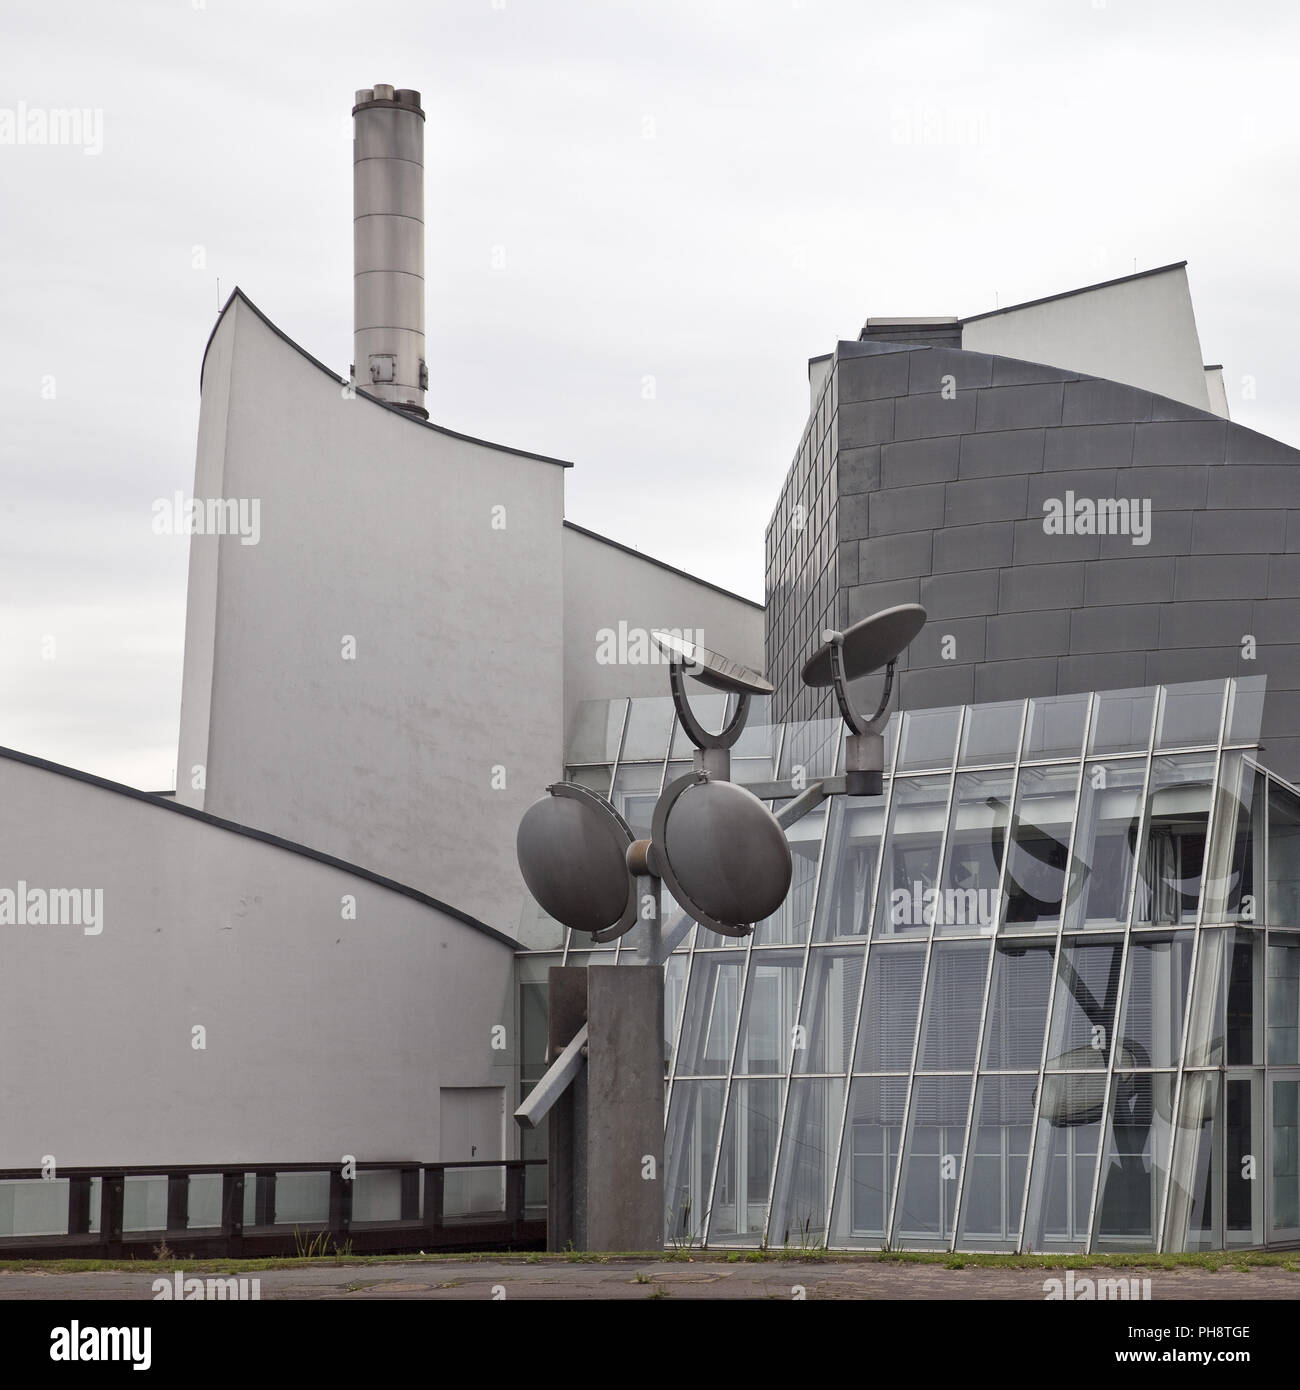 Energy Forum Innovation, Bad Oeynhausen - Stock Image